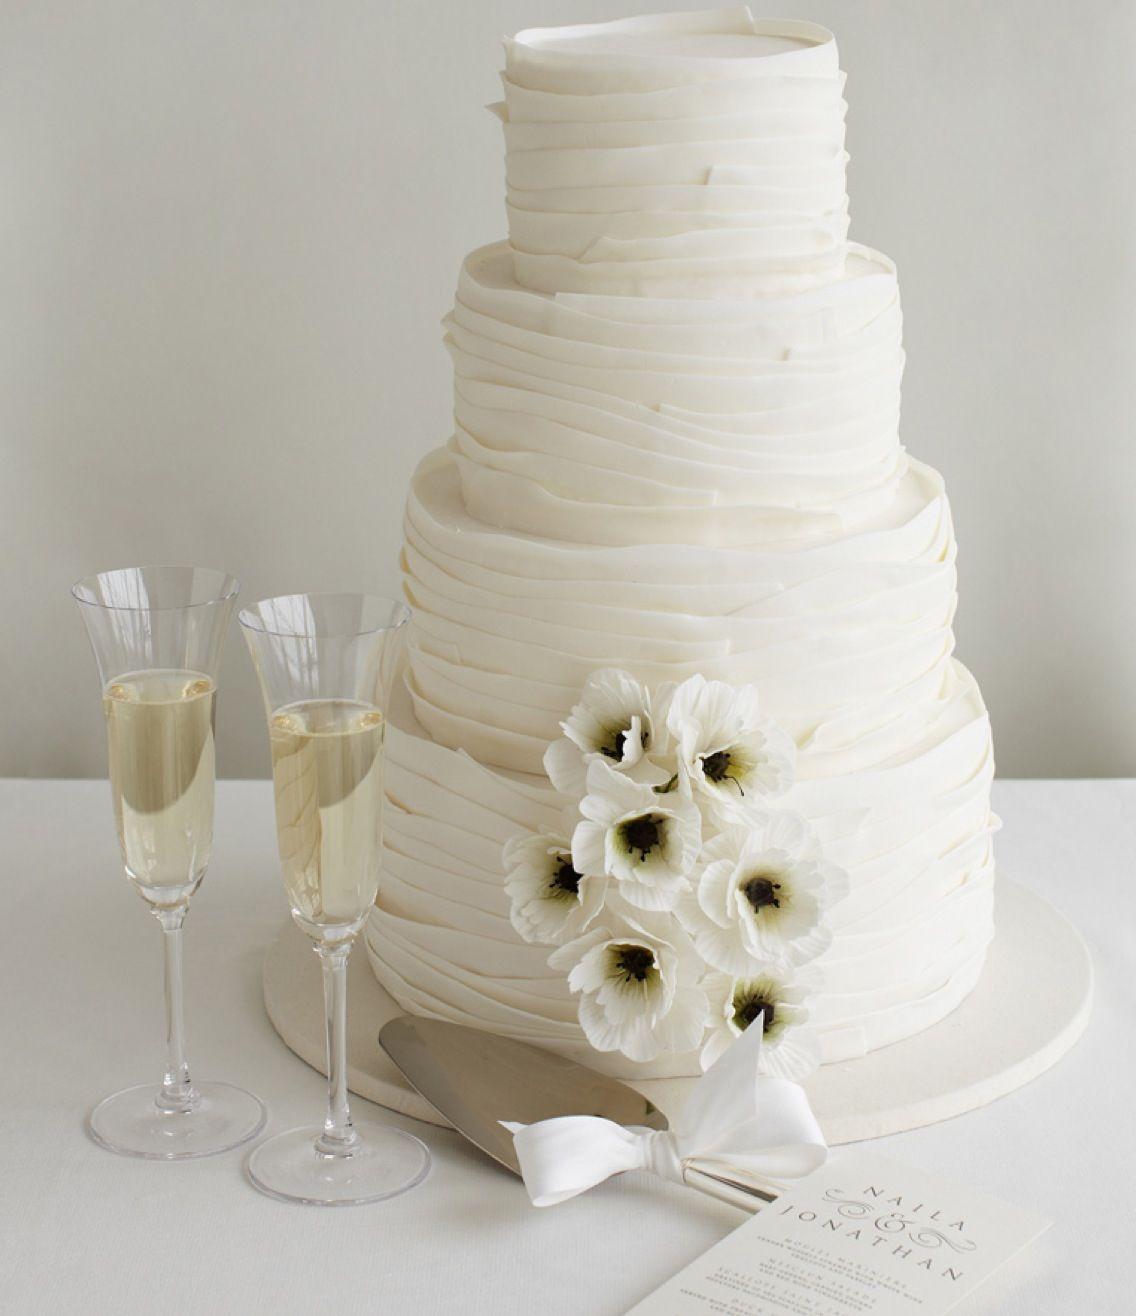 Tiered Buttercream Wedding Cake | Wedding cake ideas | Pinterest ...